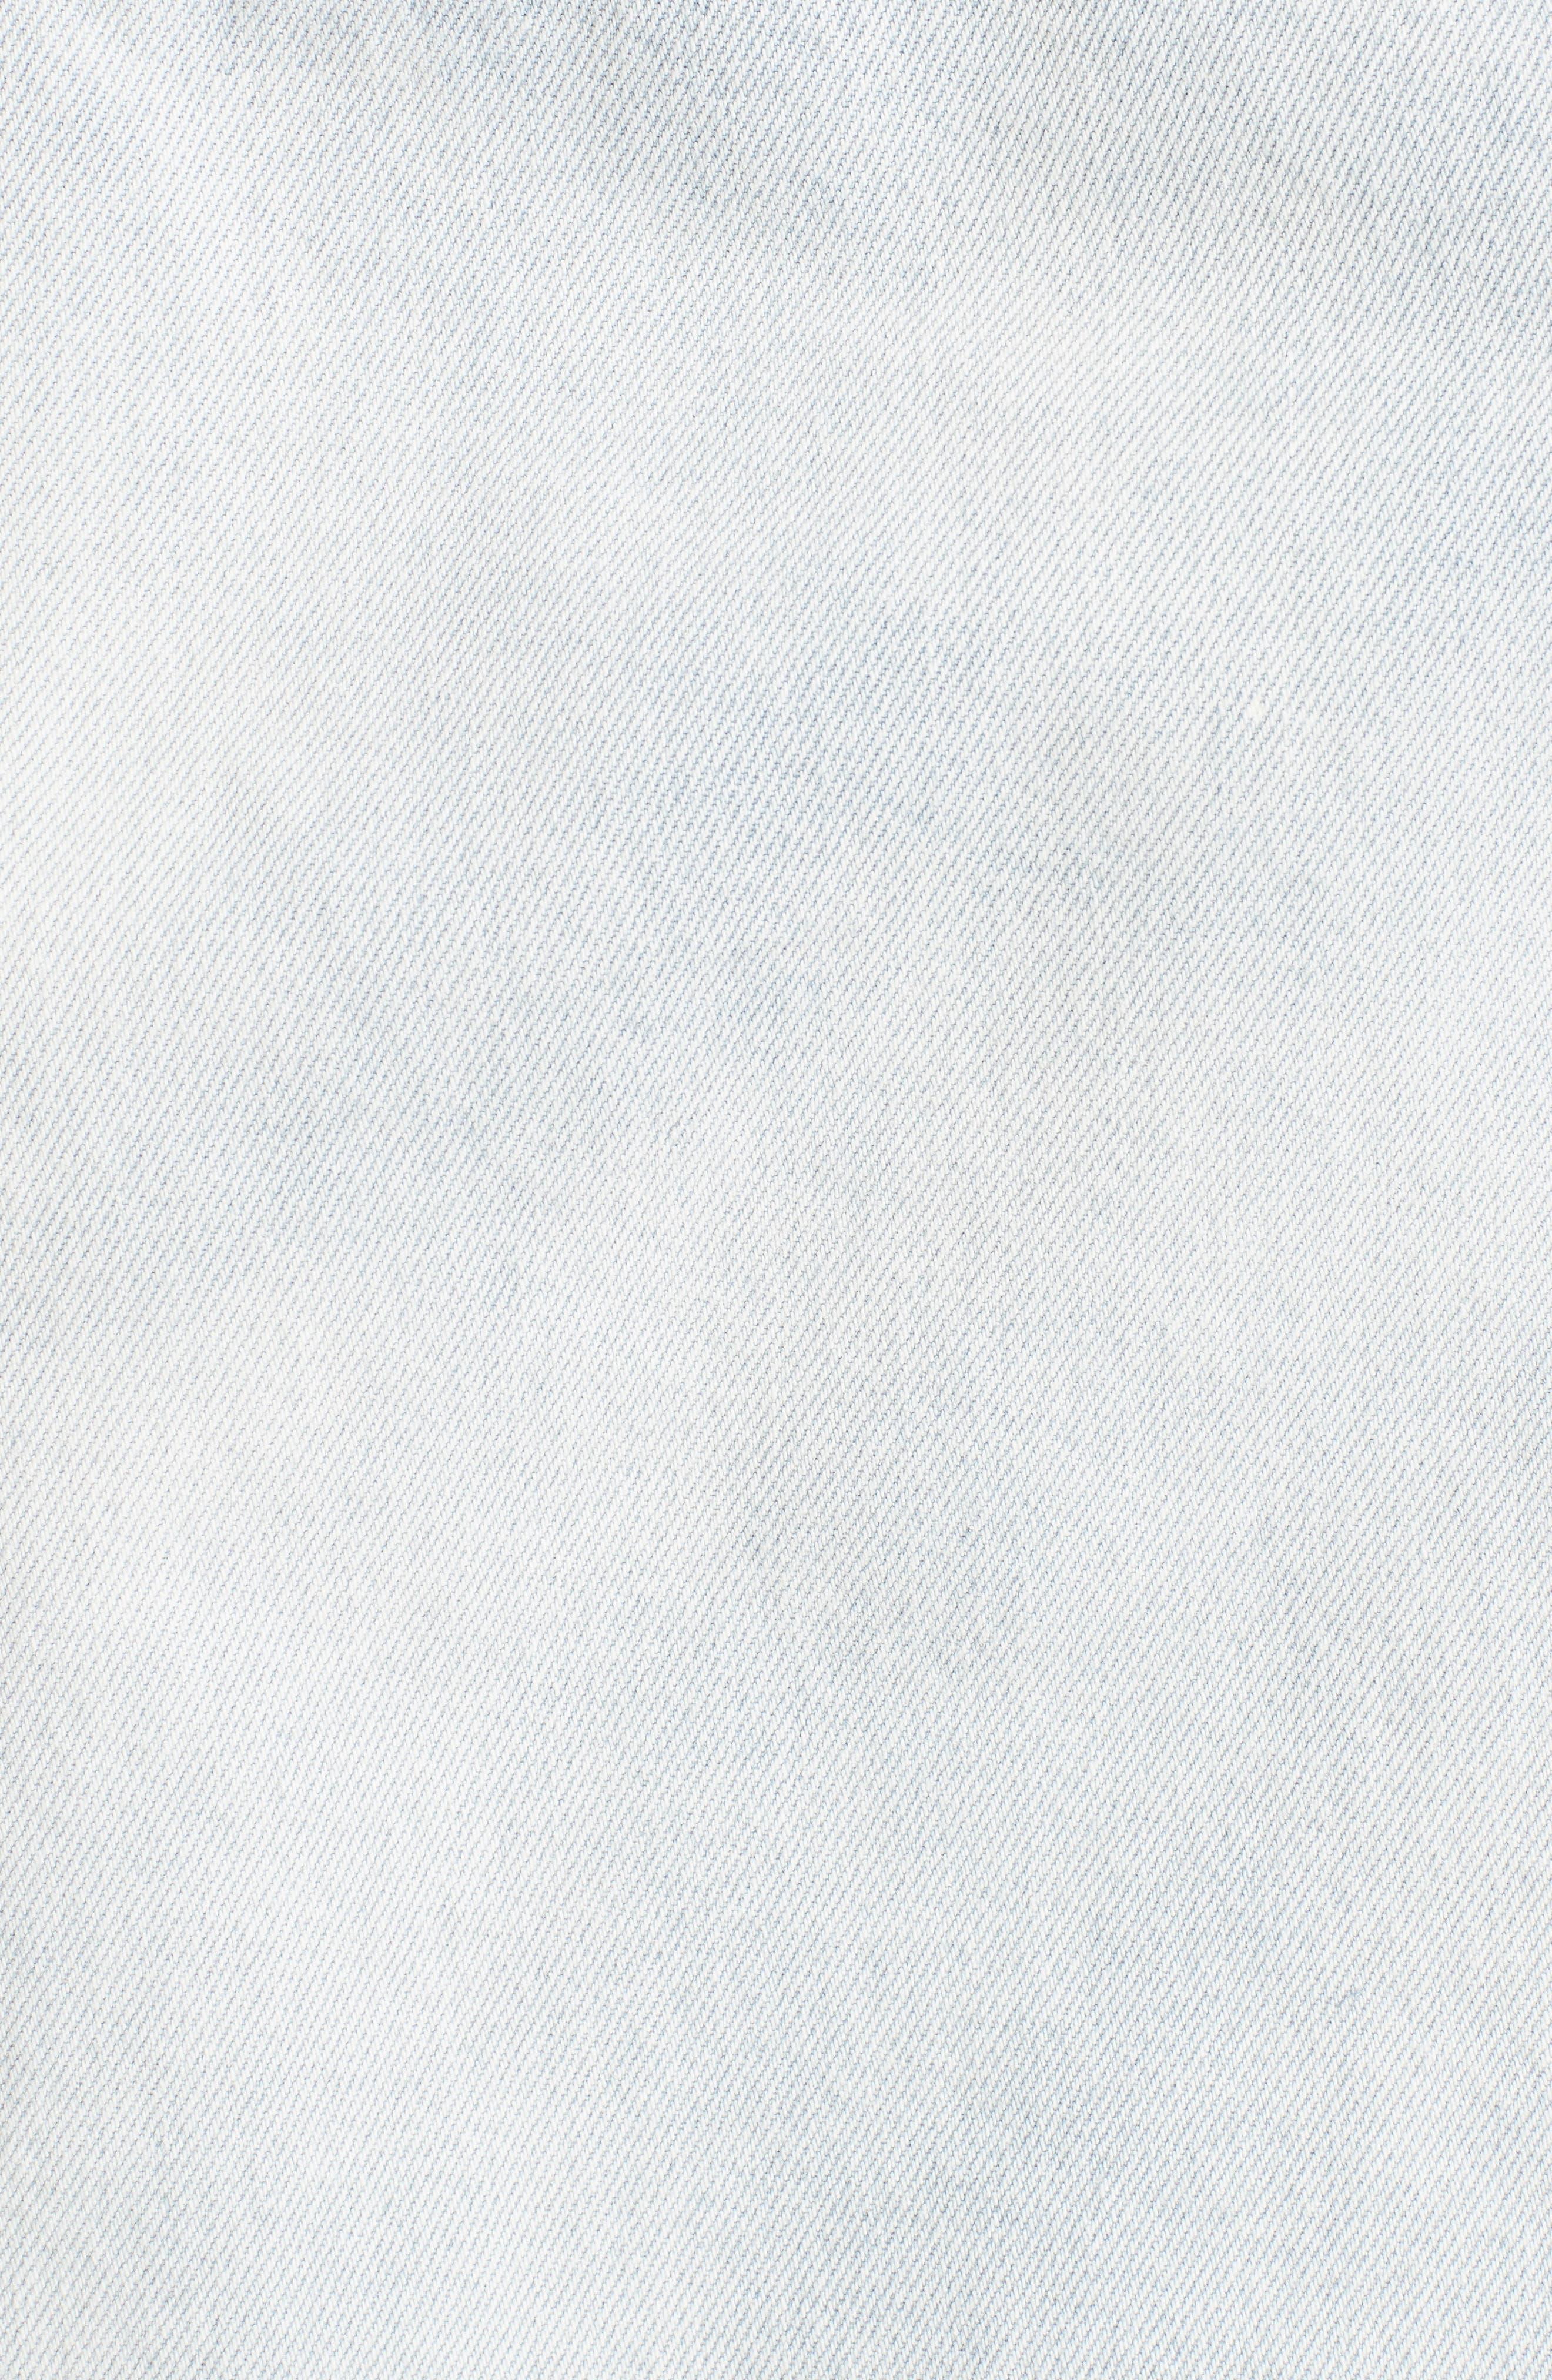 Alternate Image 5  - Levi's® Made & Crafted™ Type II Trucker Raw Edge Denim Jacket